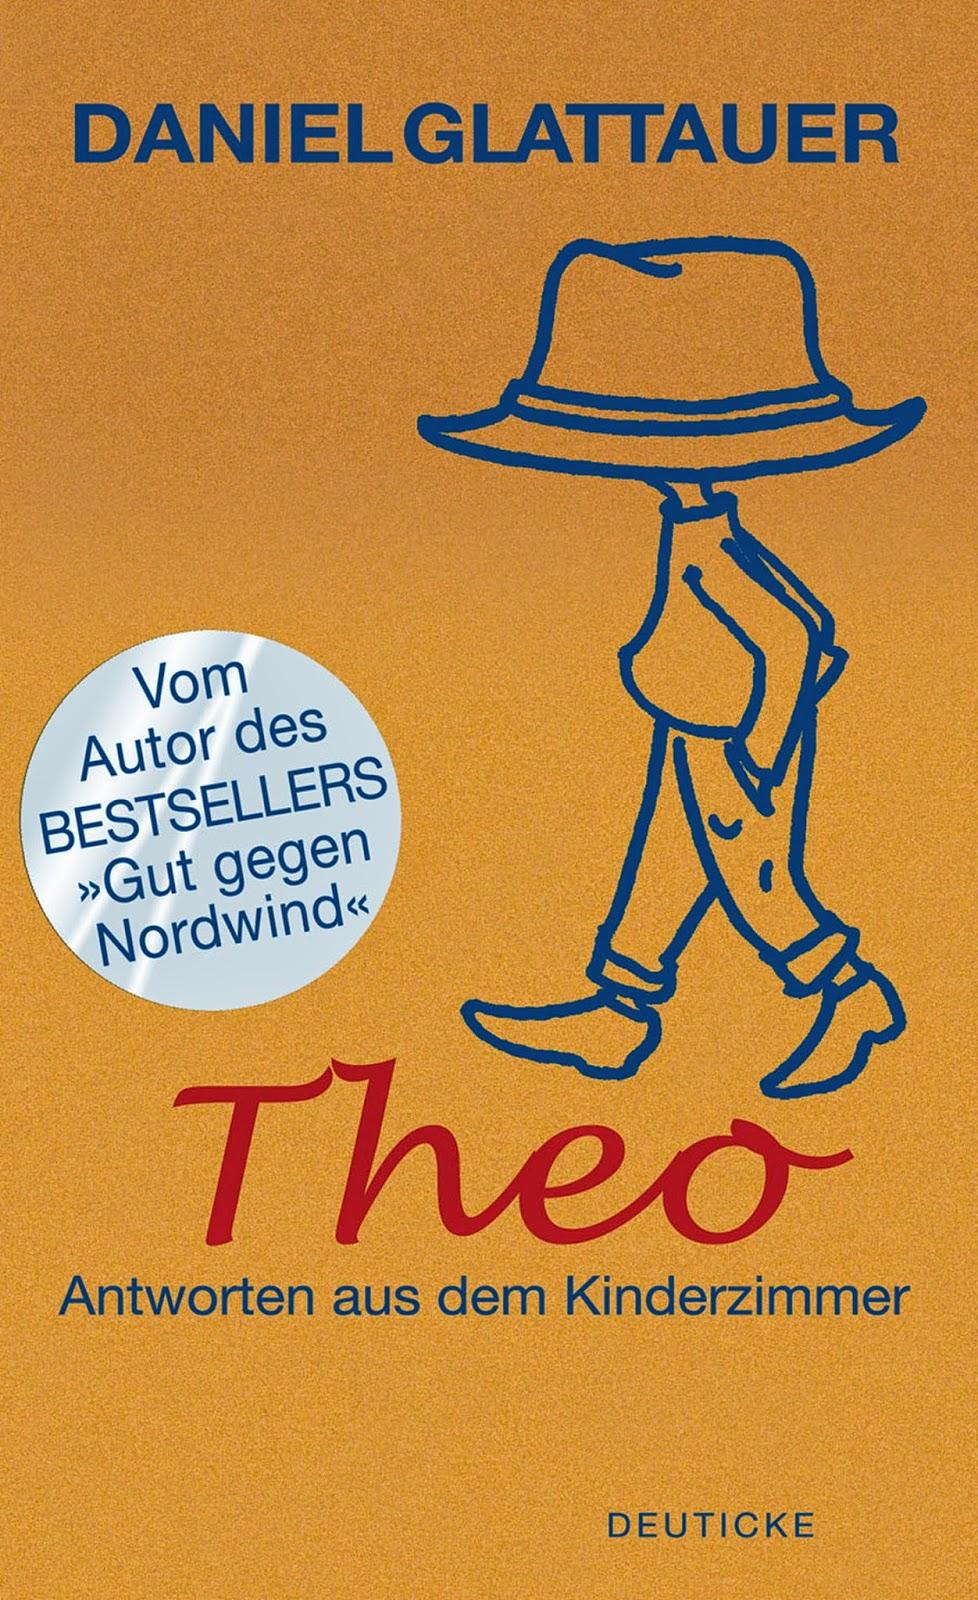 http://www.hanser-literaturverlage.de/buecher/buch.html?isbn=978-3-552-06140-8